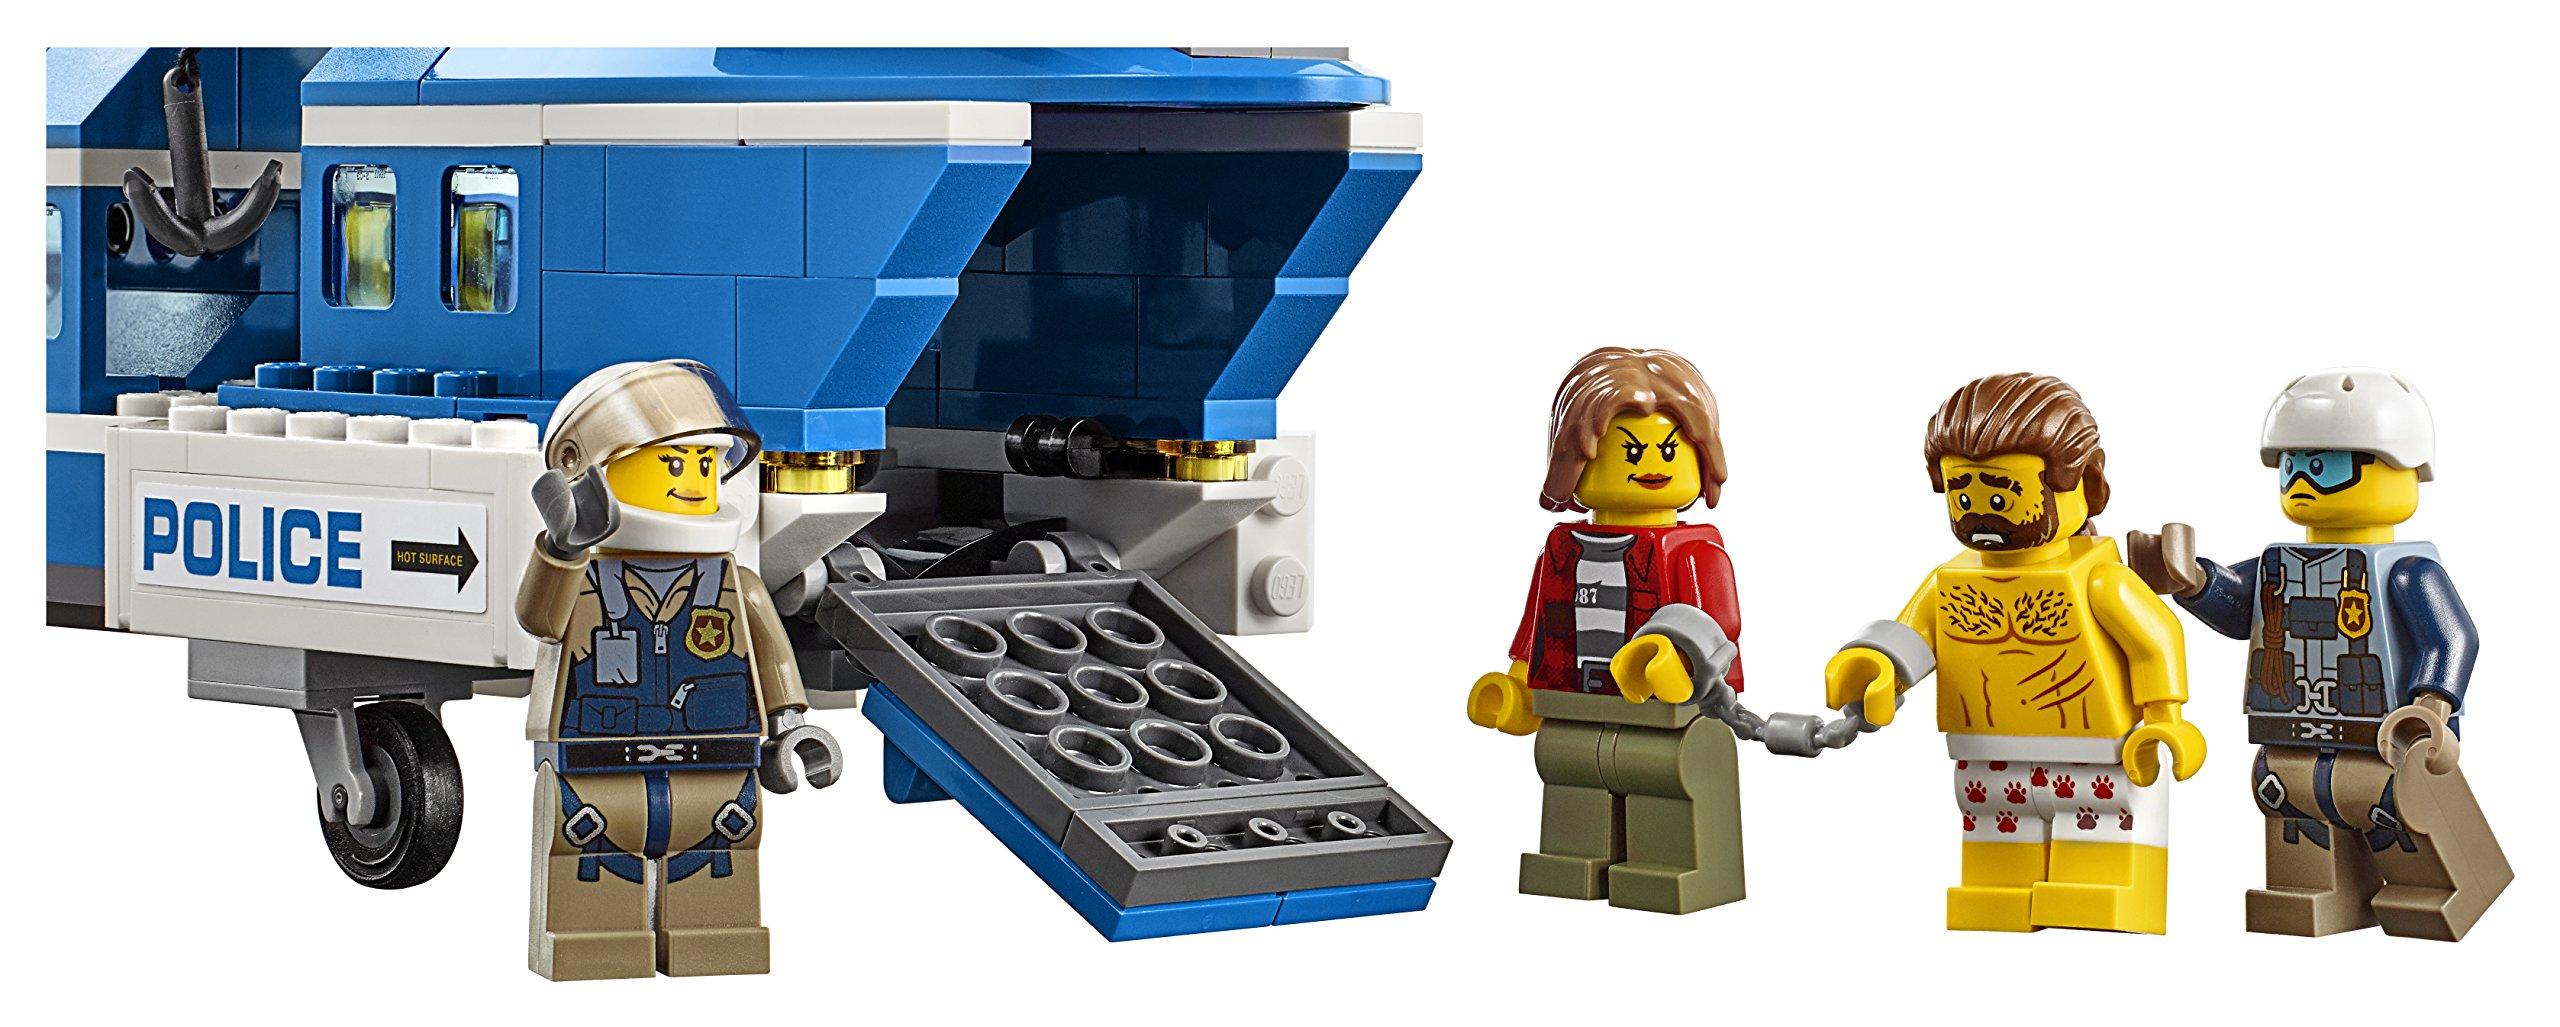 LEGO- City PoliceArresto in Montagna, Multicolore, 60173 5 spesavip